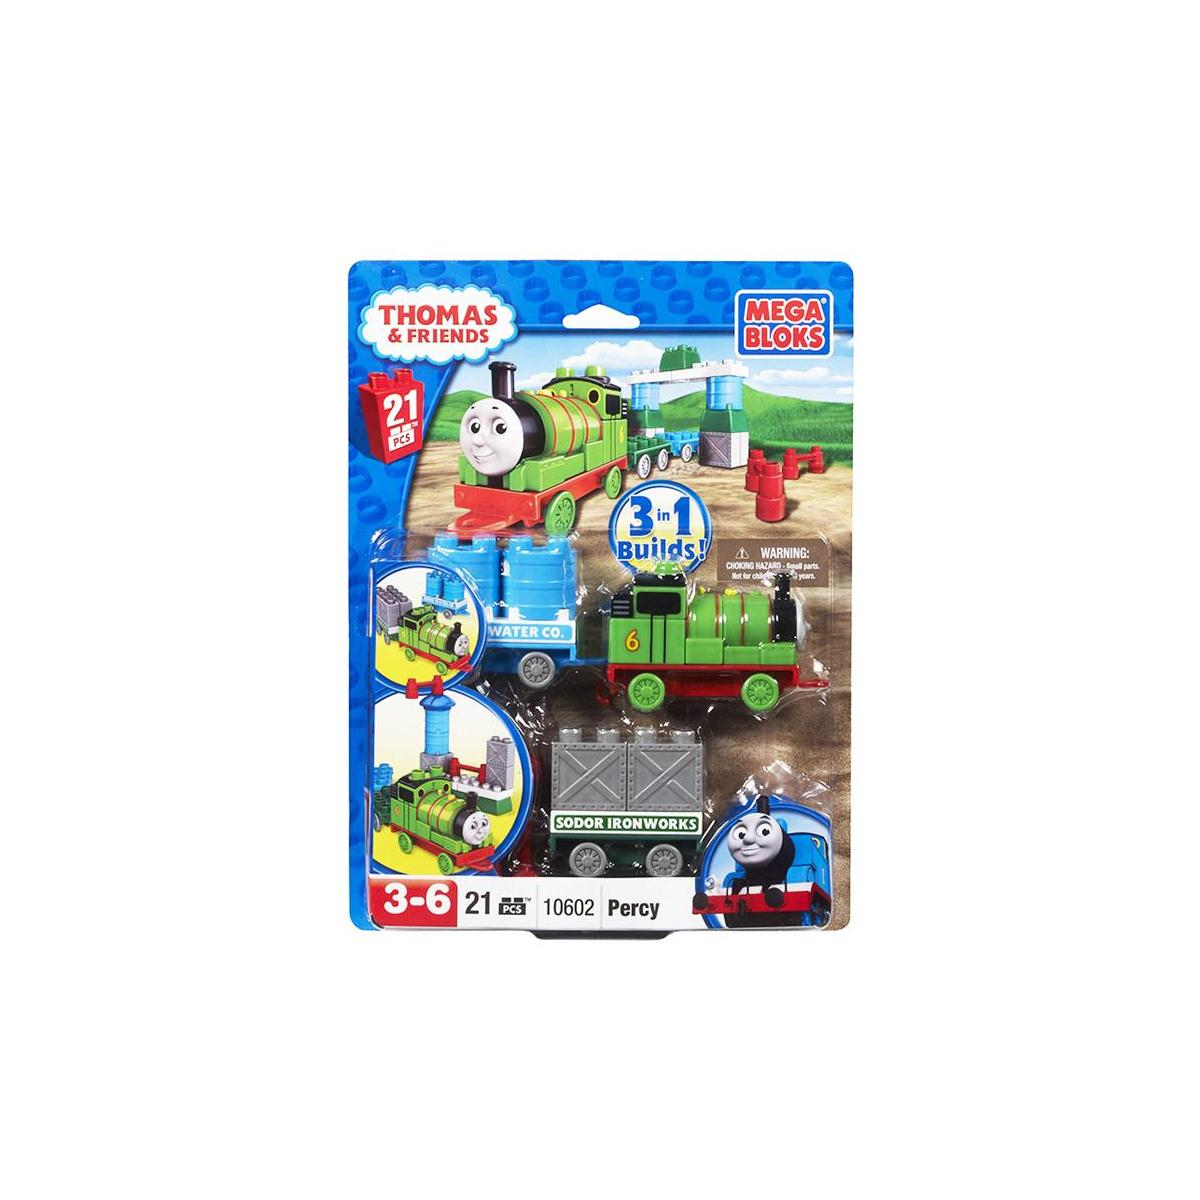 Lego Ve Parcali Bloklar Mega Bloks Thomas Ve Arkadaslari Percy